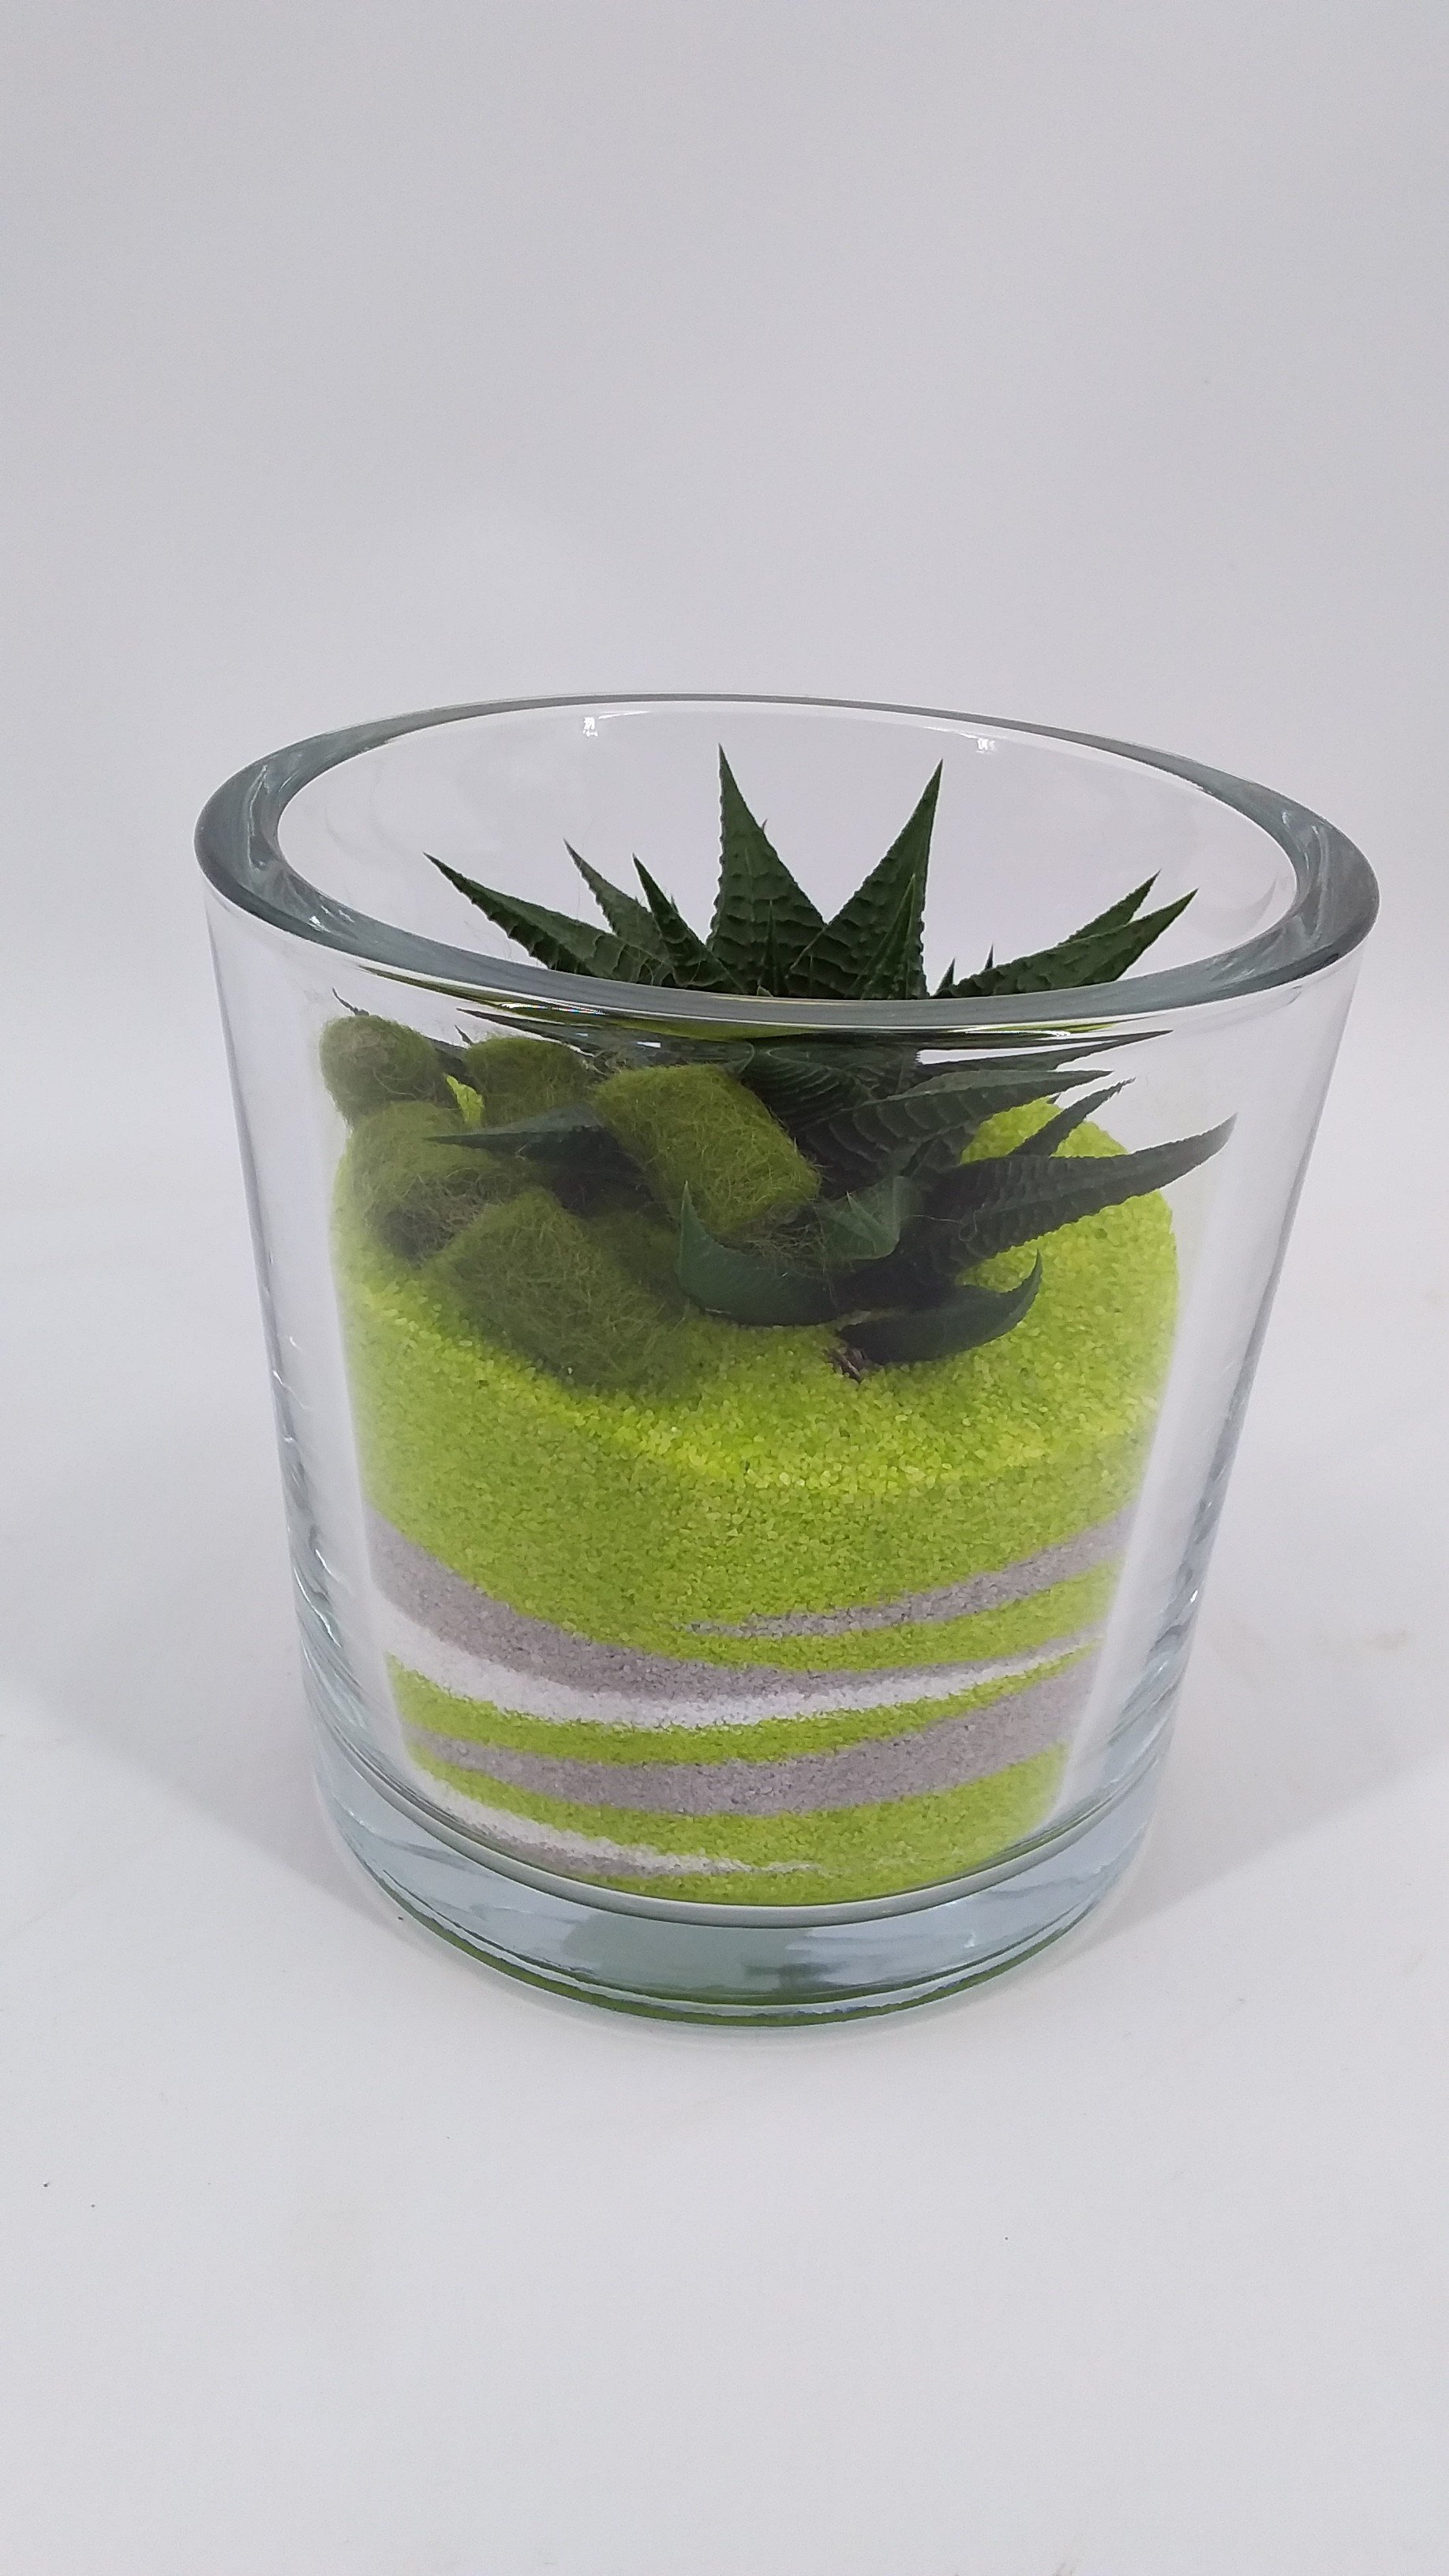 Zandpotje groen